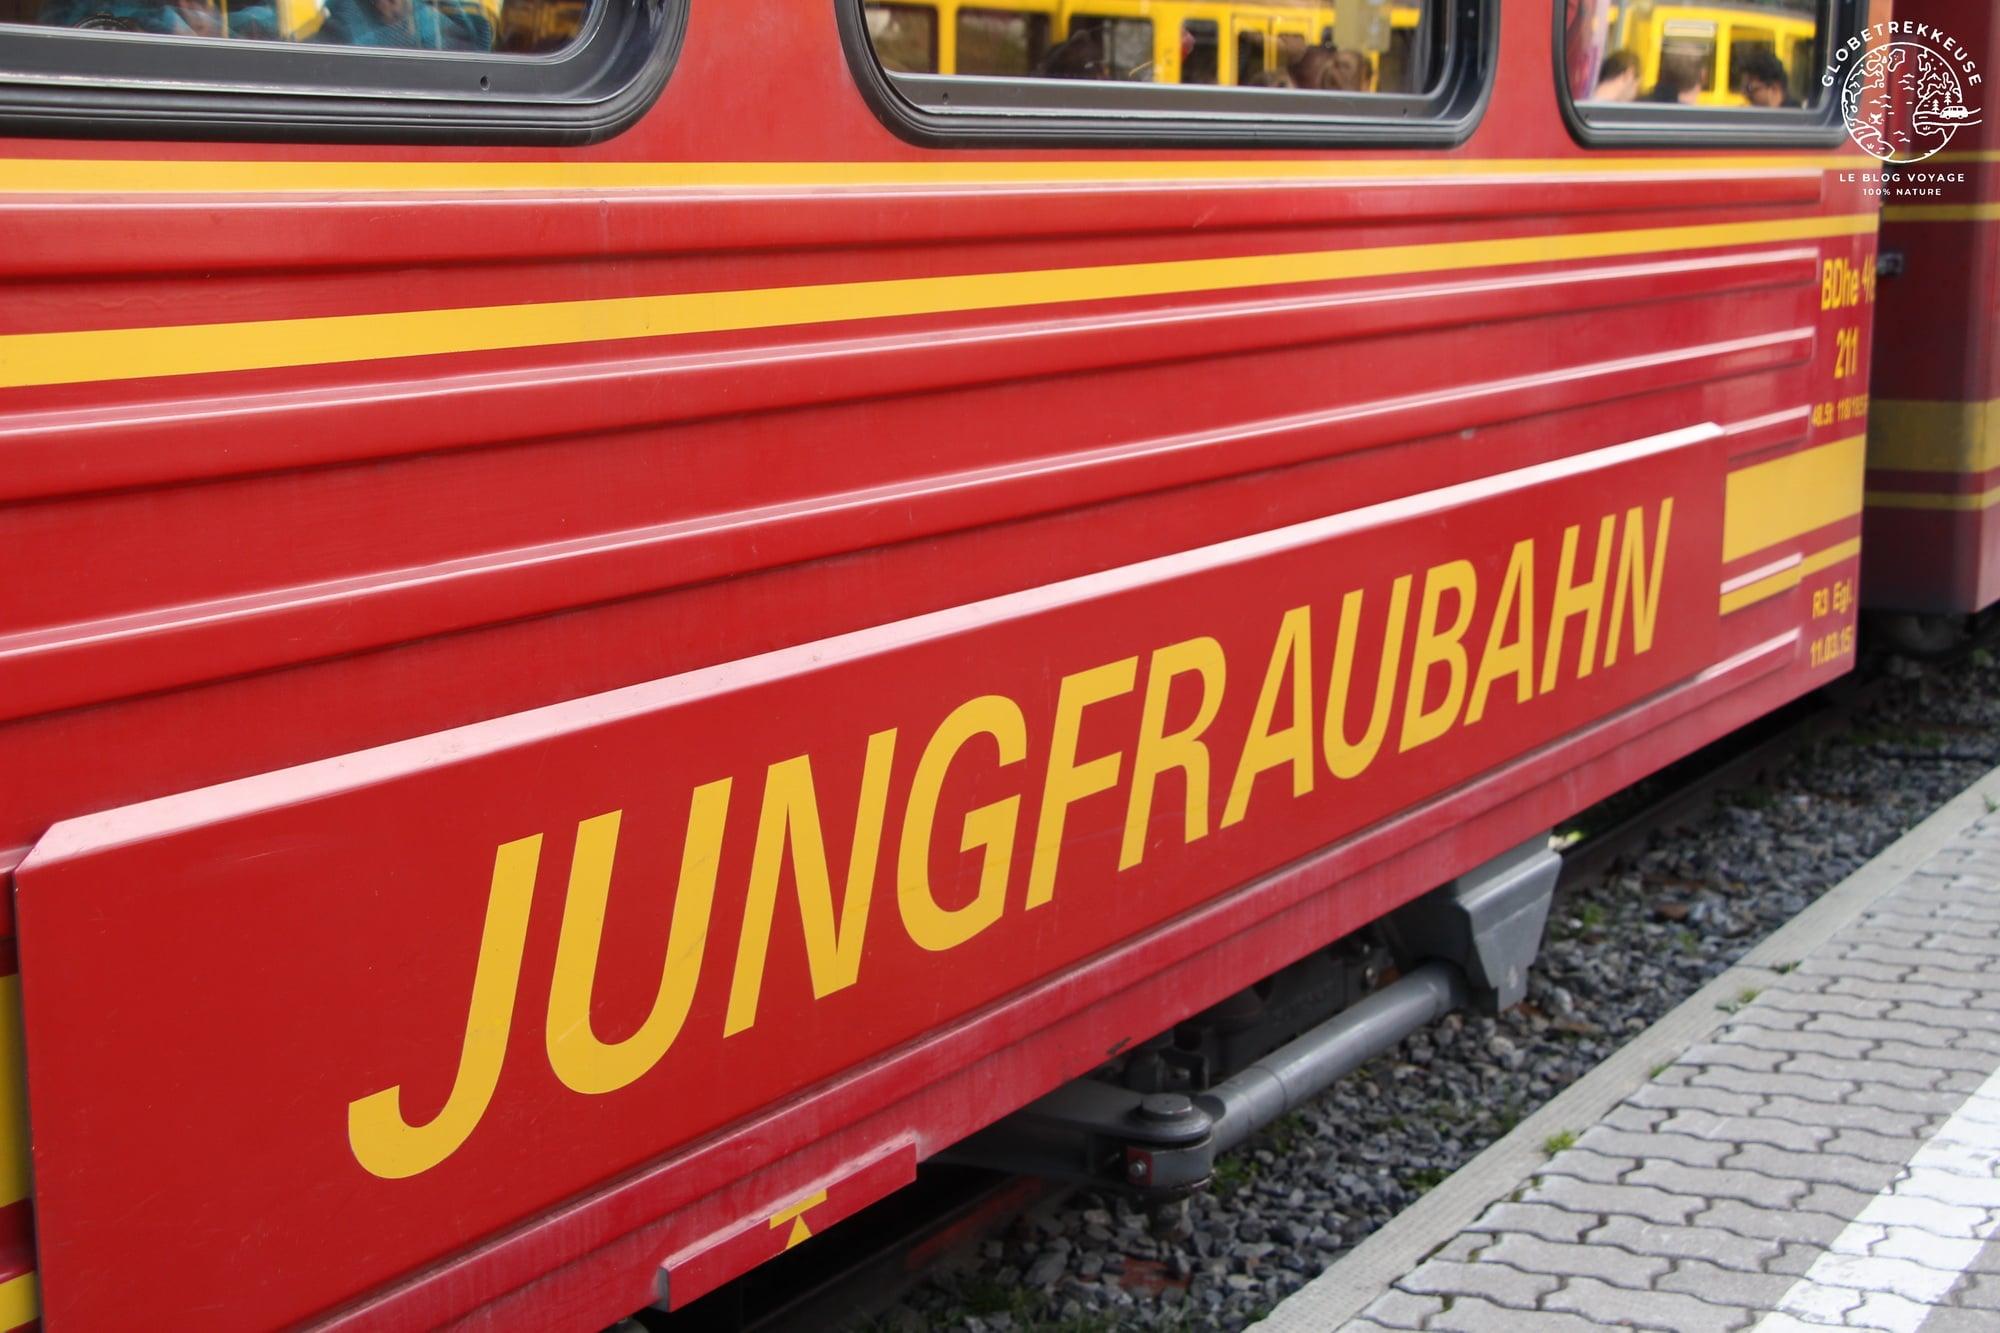 jungfraujoch train cremaillere jungfraubahn